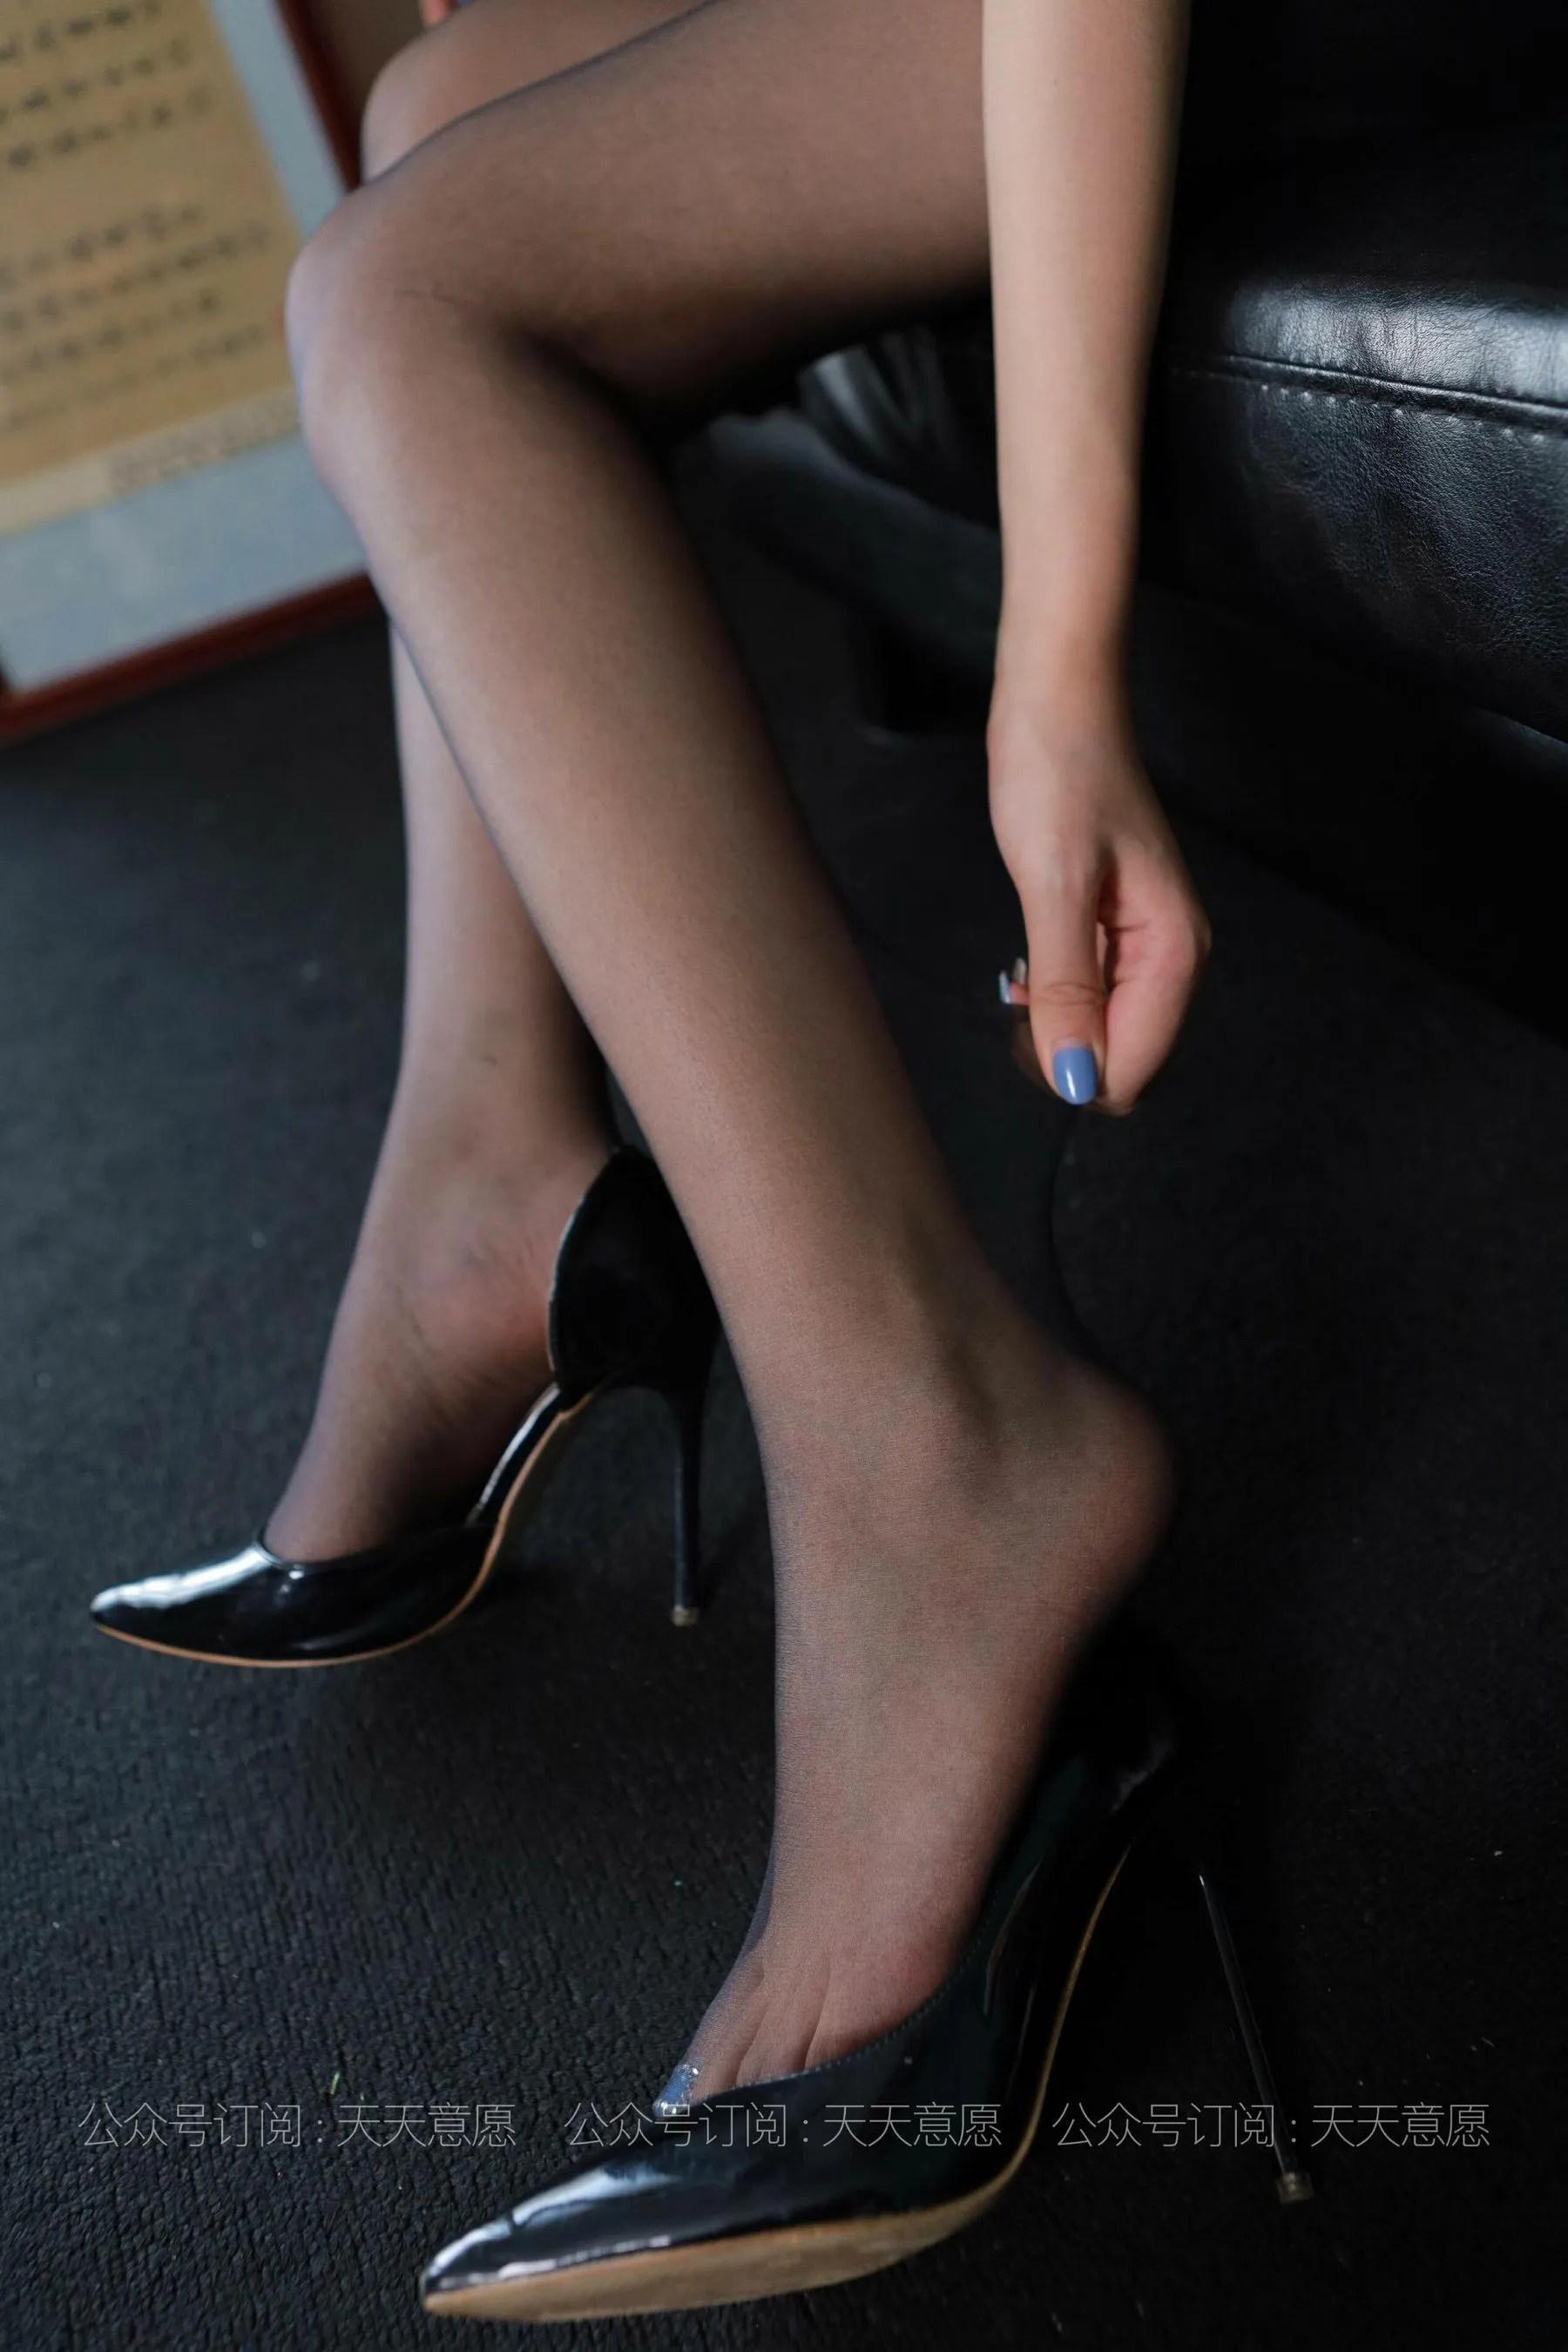 [IESS] 丝享家816: 西瓜《美腿细长直》[92P]插图(8)